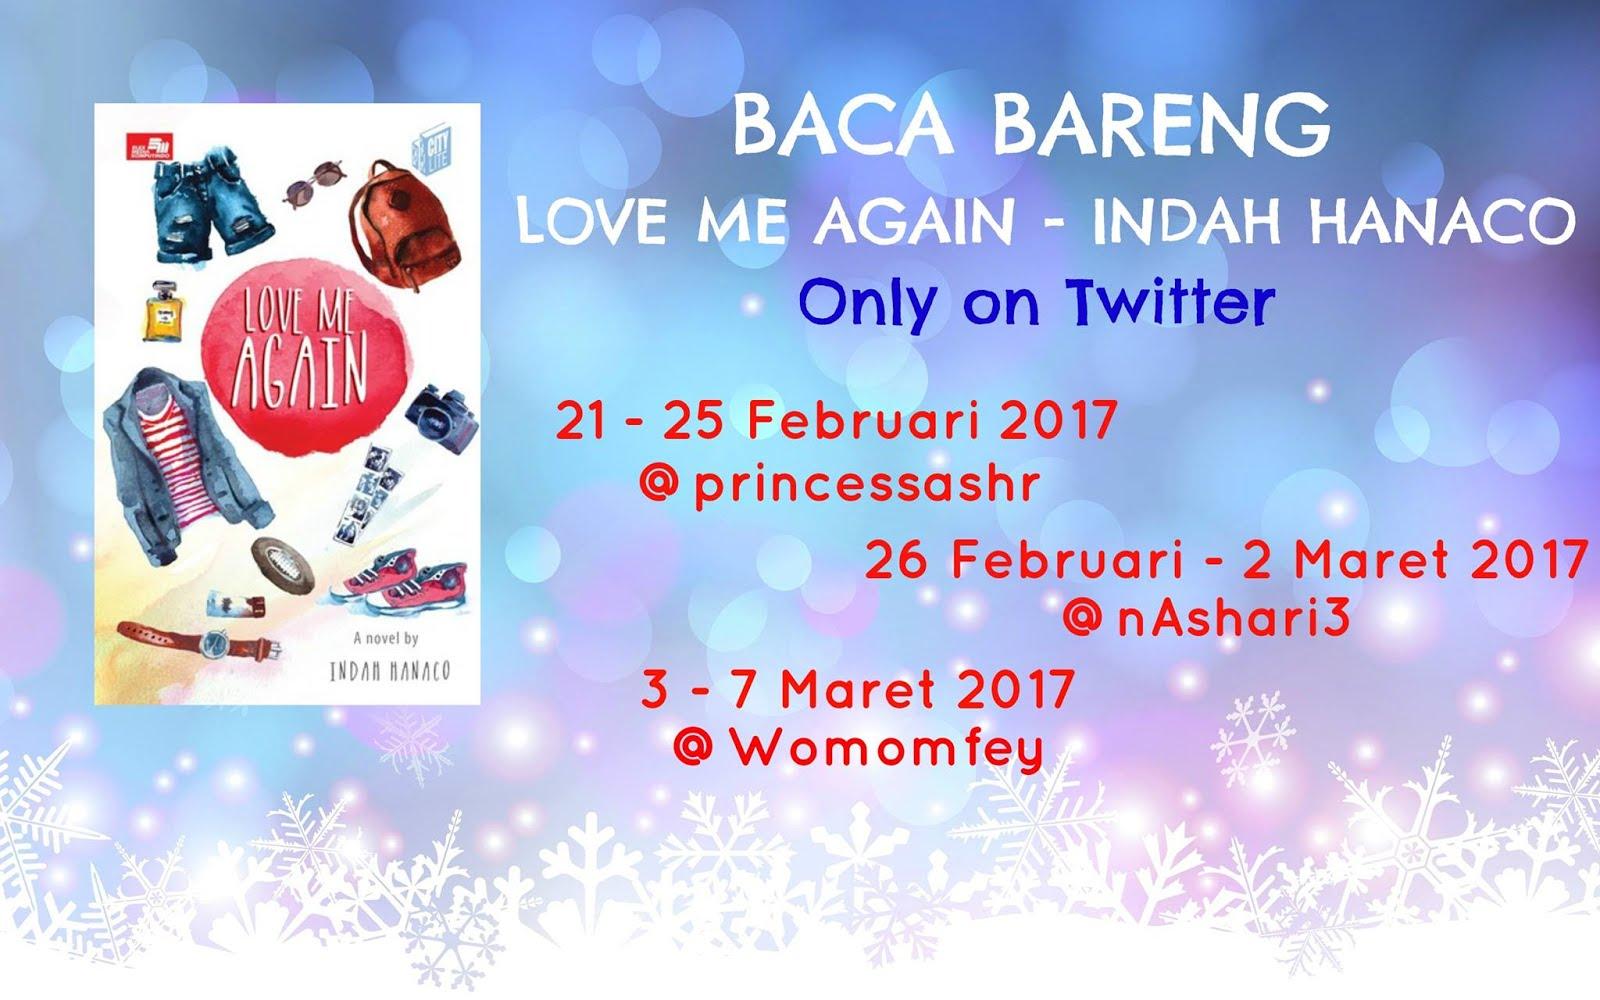 Baca Bareng #LoveMeAgain Indah Hanaco